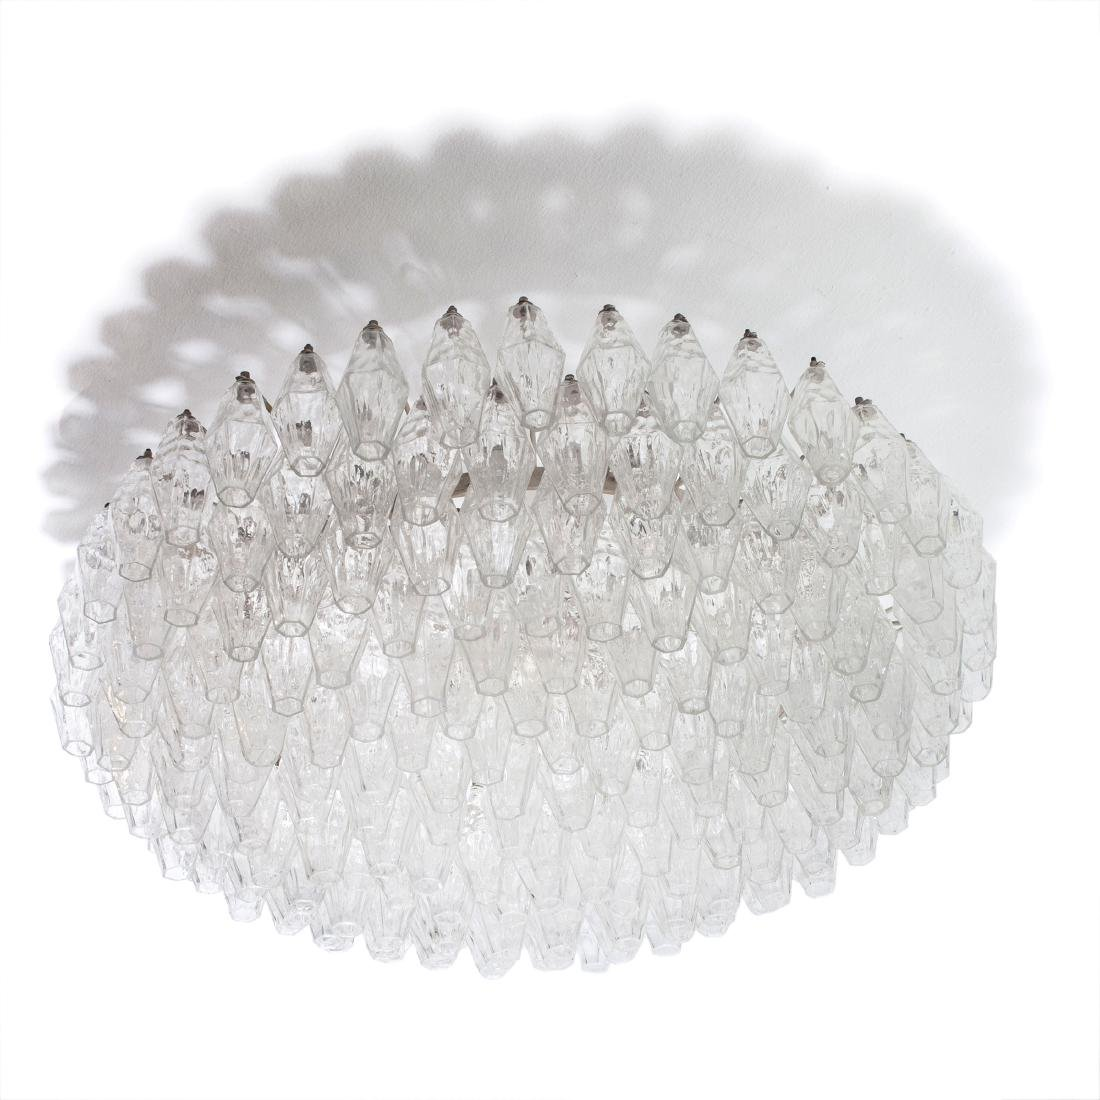 'Poliedrica' ceiling light, c. 1958